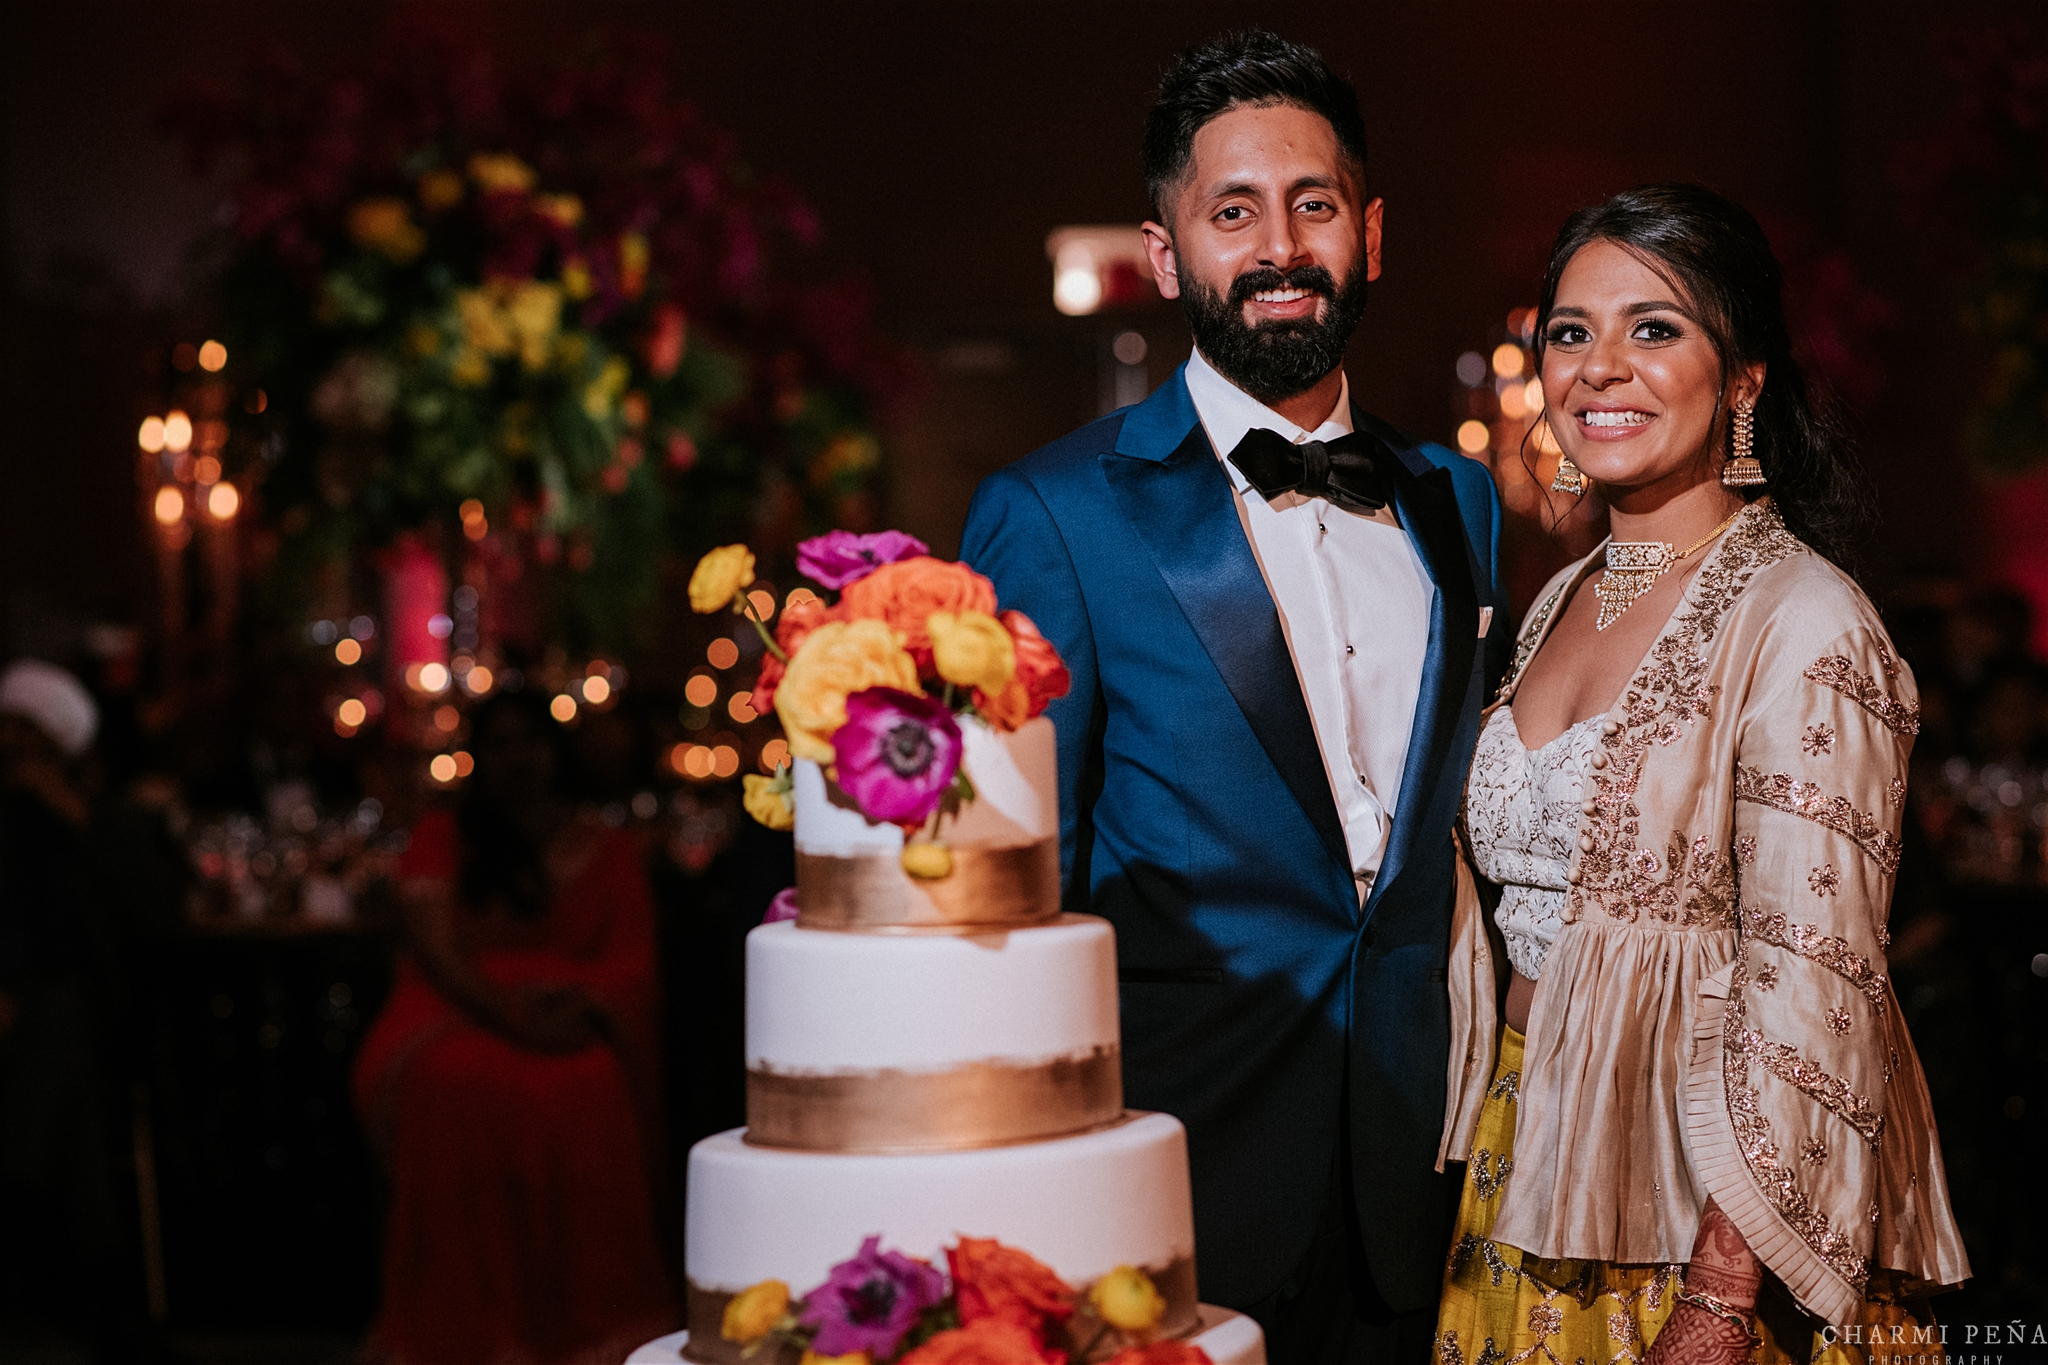 INDIAN WEDDING RECEPTION BRIDE AND GROOM CUTTING CAKE.jpg